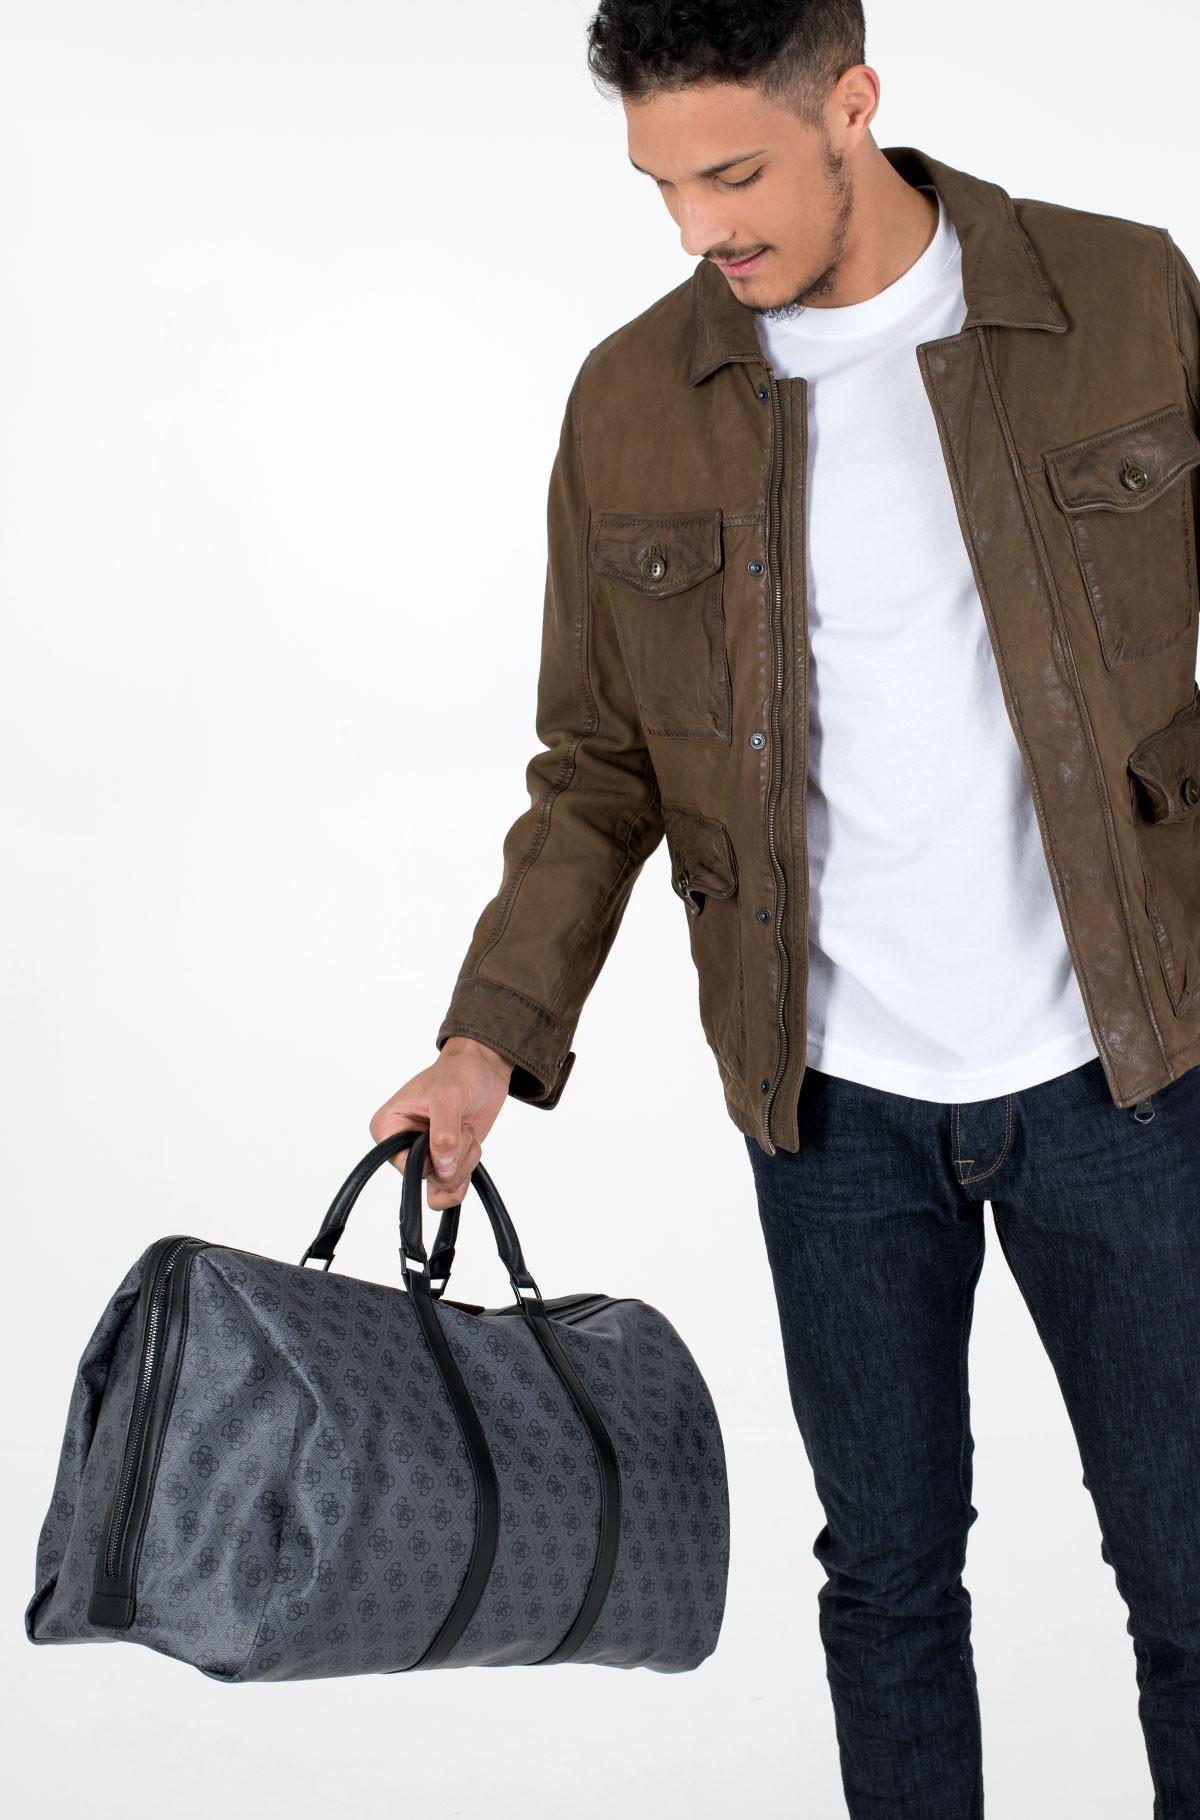 Travel bag  TMVEZL P1135-full-1